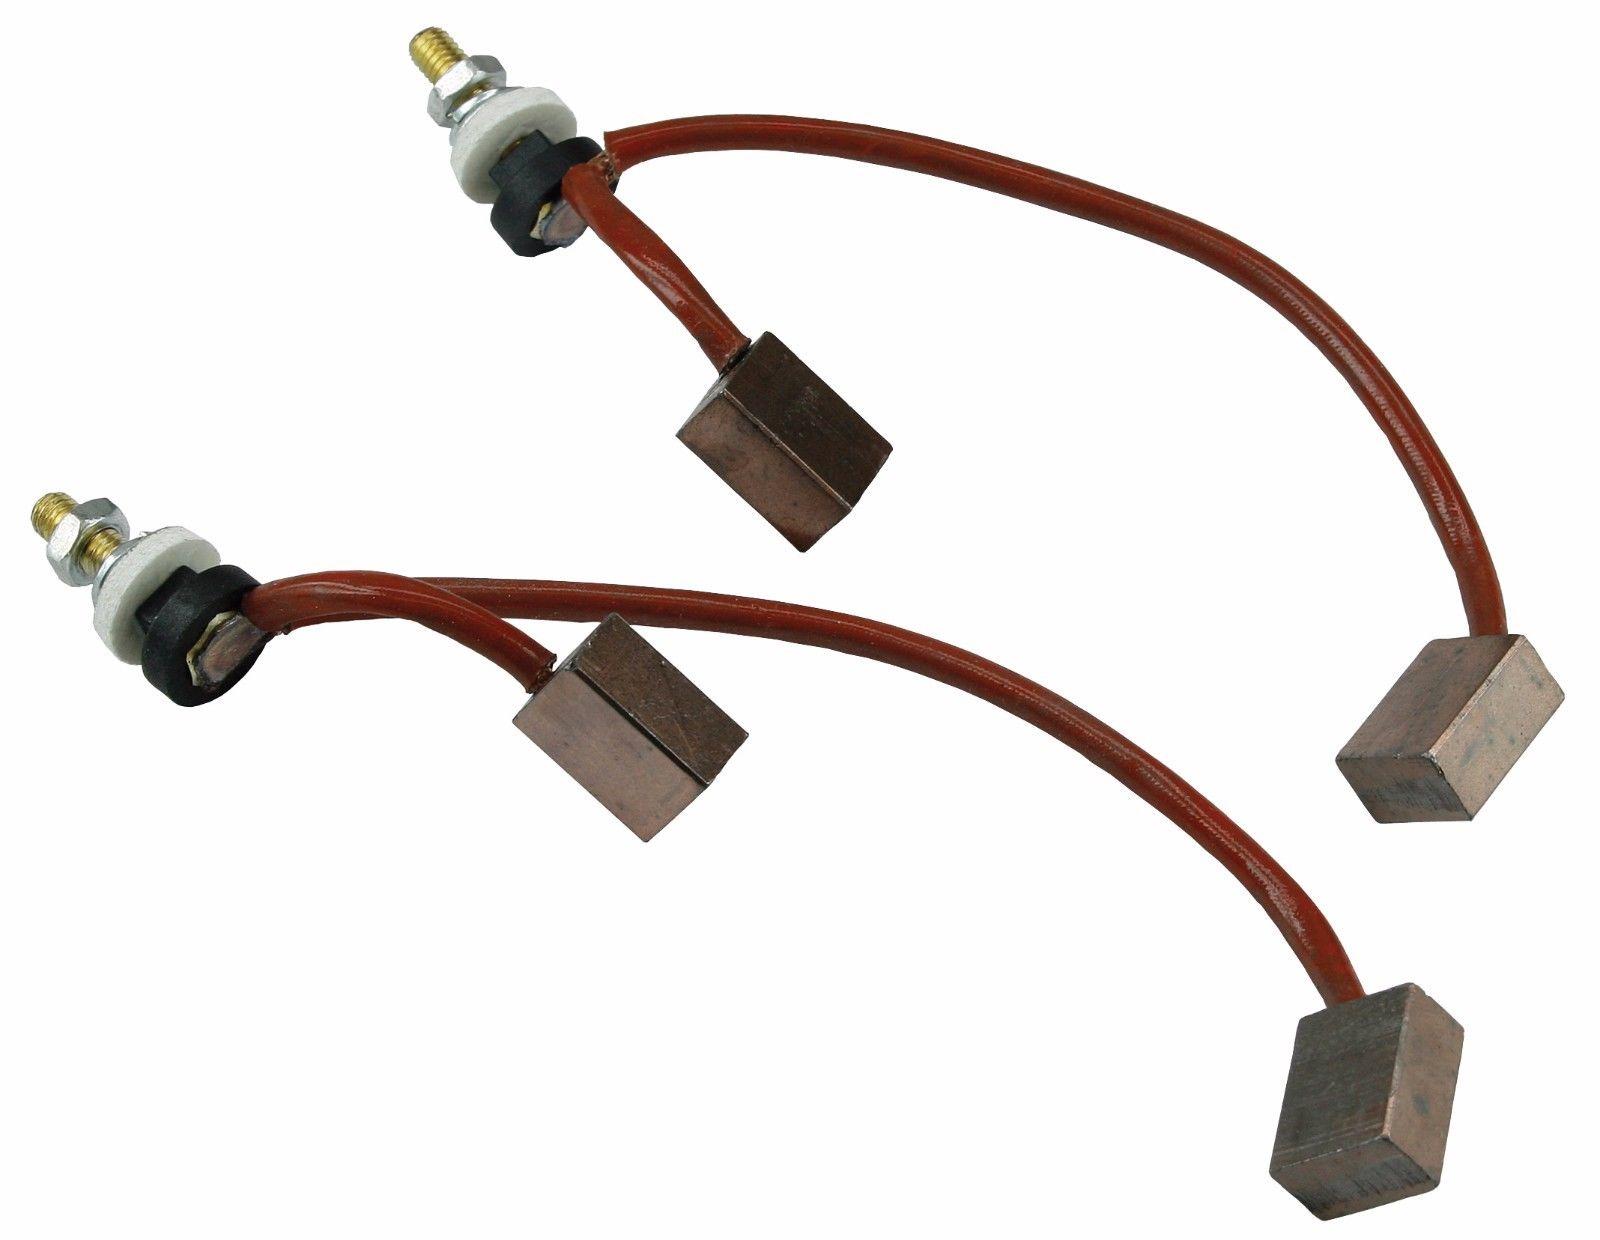 Electrical Starter Generator Vintage Golf Cart Parts Inc 1970 S Ez Go 2 Stroke Wiring Diagram Br44 000 Brush Set Advanced Str Gen